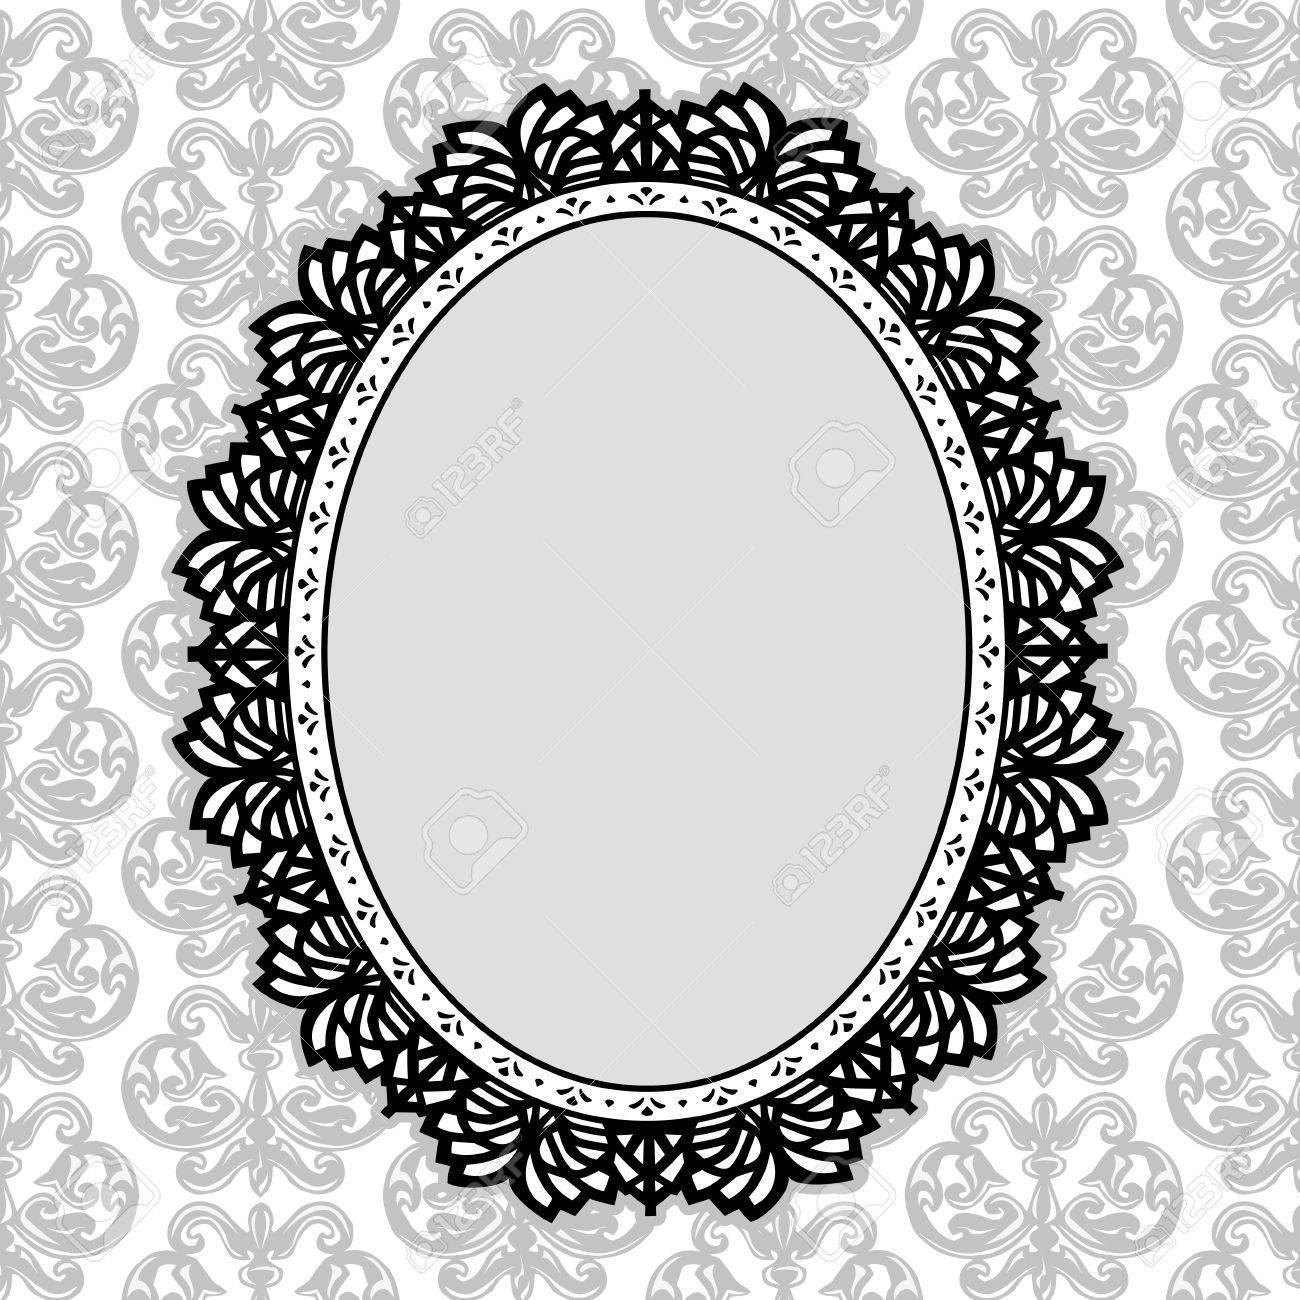 Vintage Lace Picture Frame Oval Doily With Fleur De Lis Background